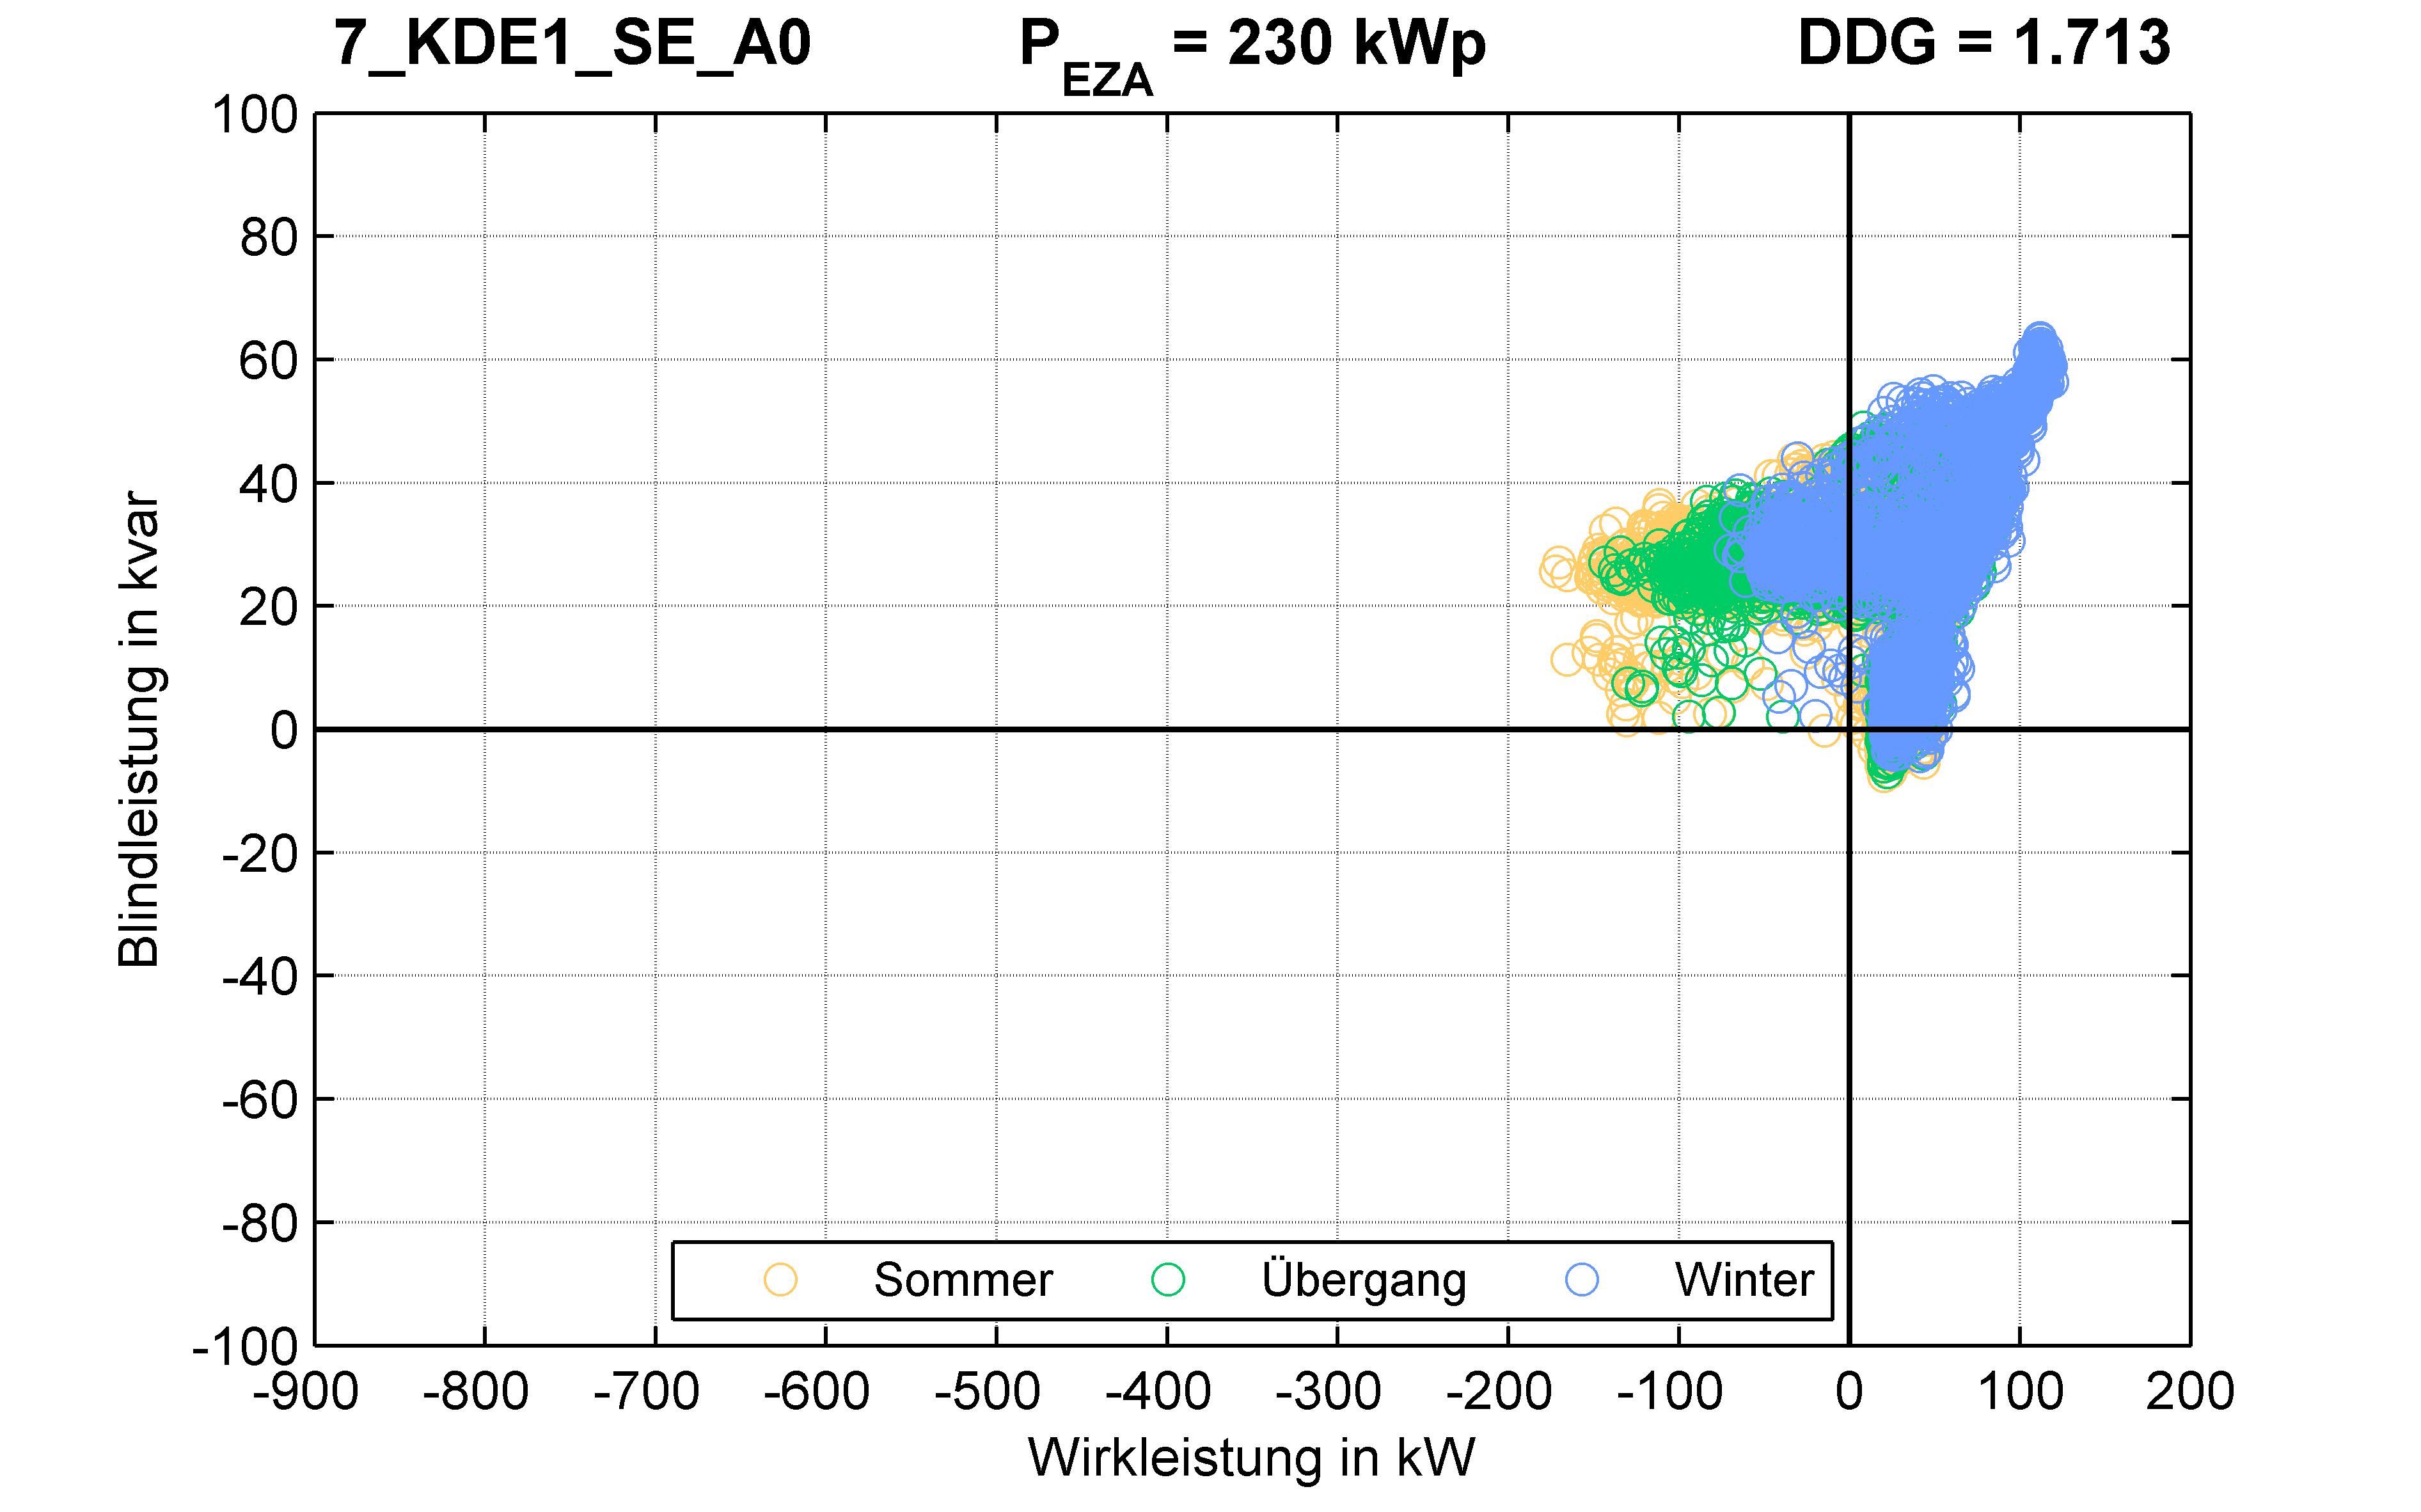 KDE1 | Längsregler (SE) A0 | PQ-Verhalten